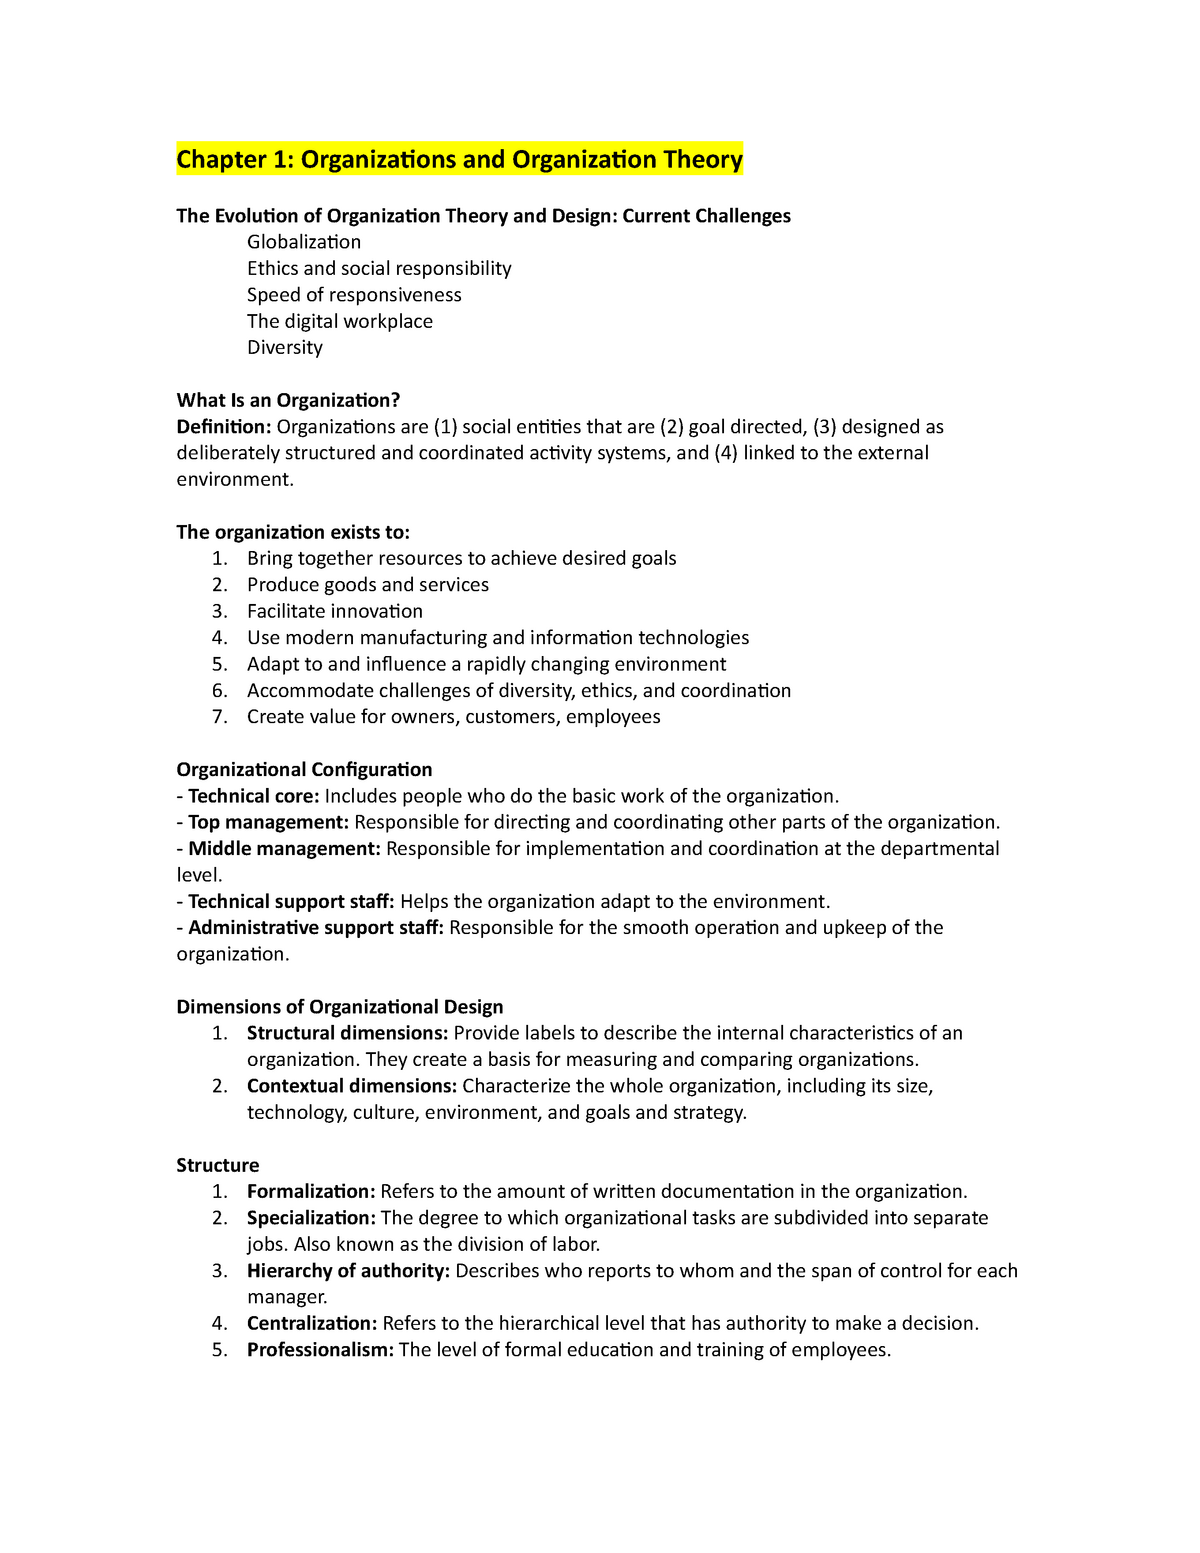 Midterm Review Mana 341 Organizational Theory And Design Studocu